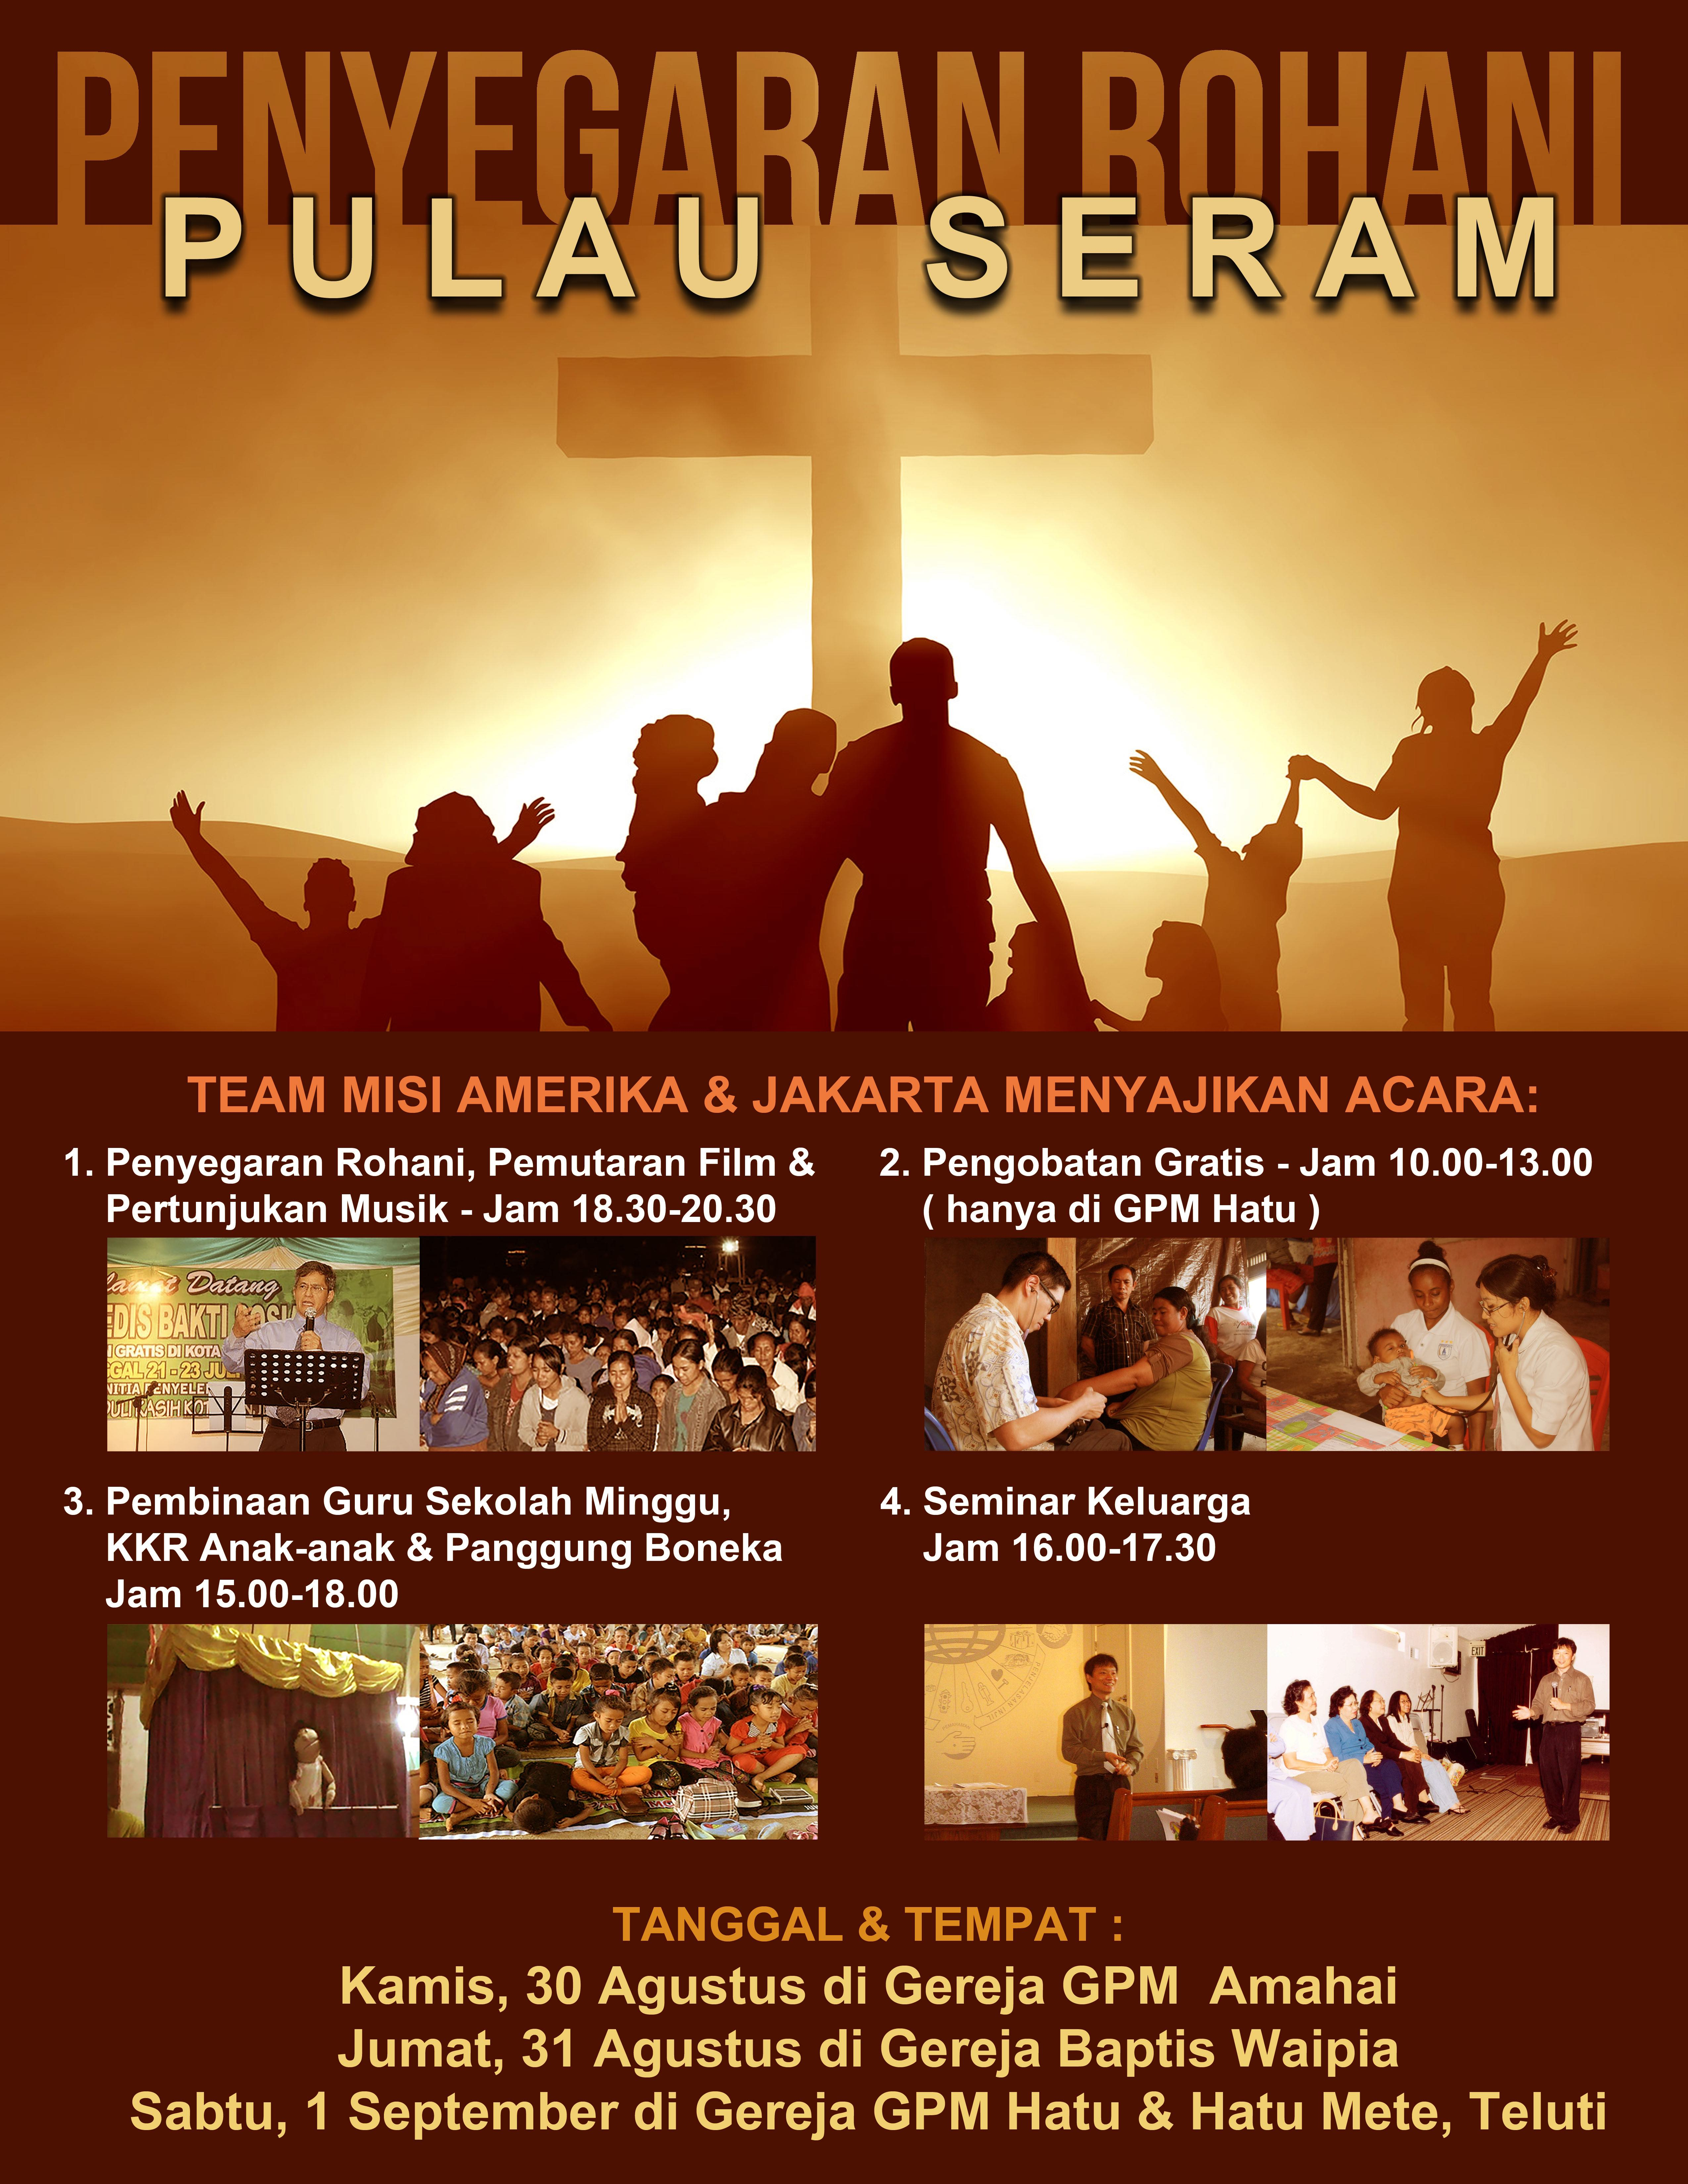 Pulau Seram Mission Trip